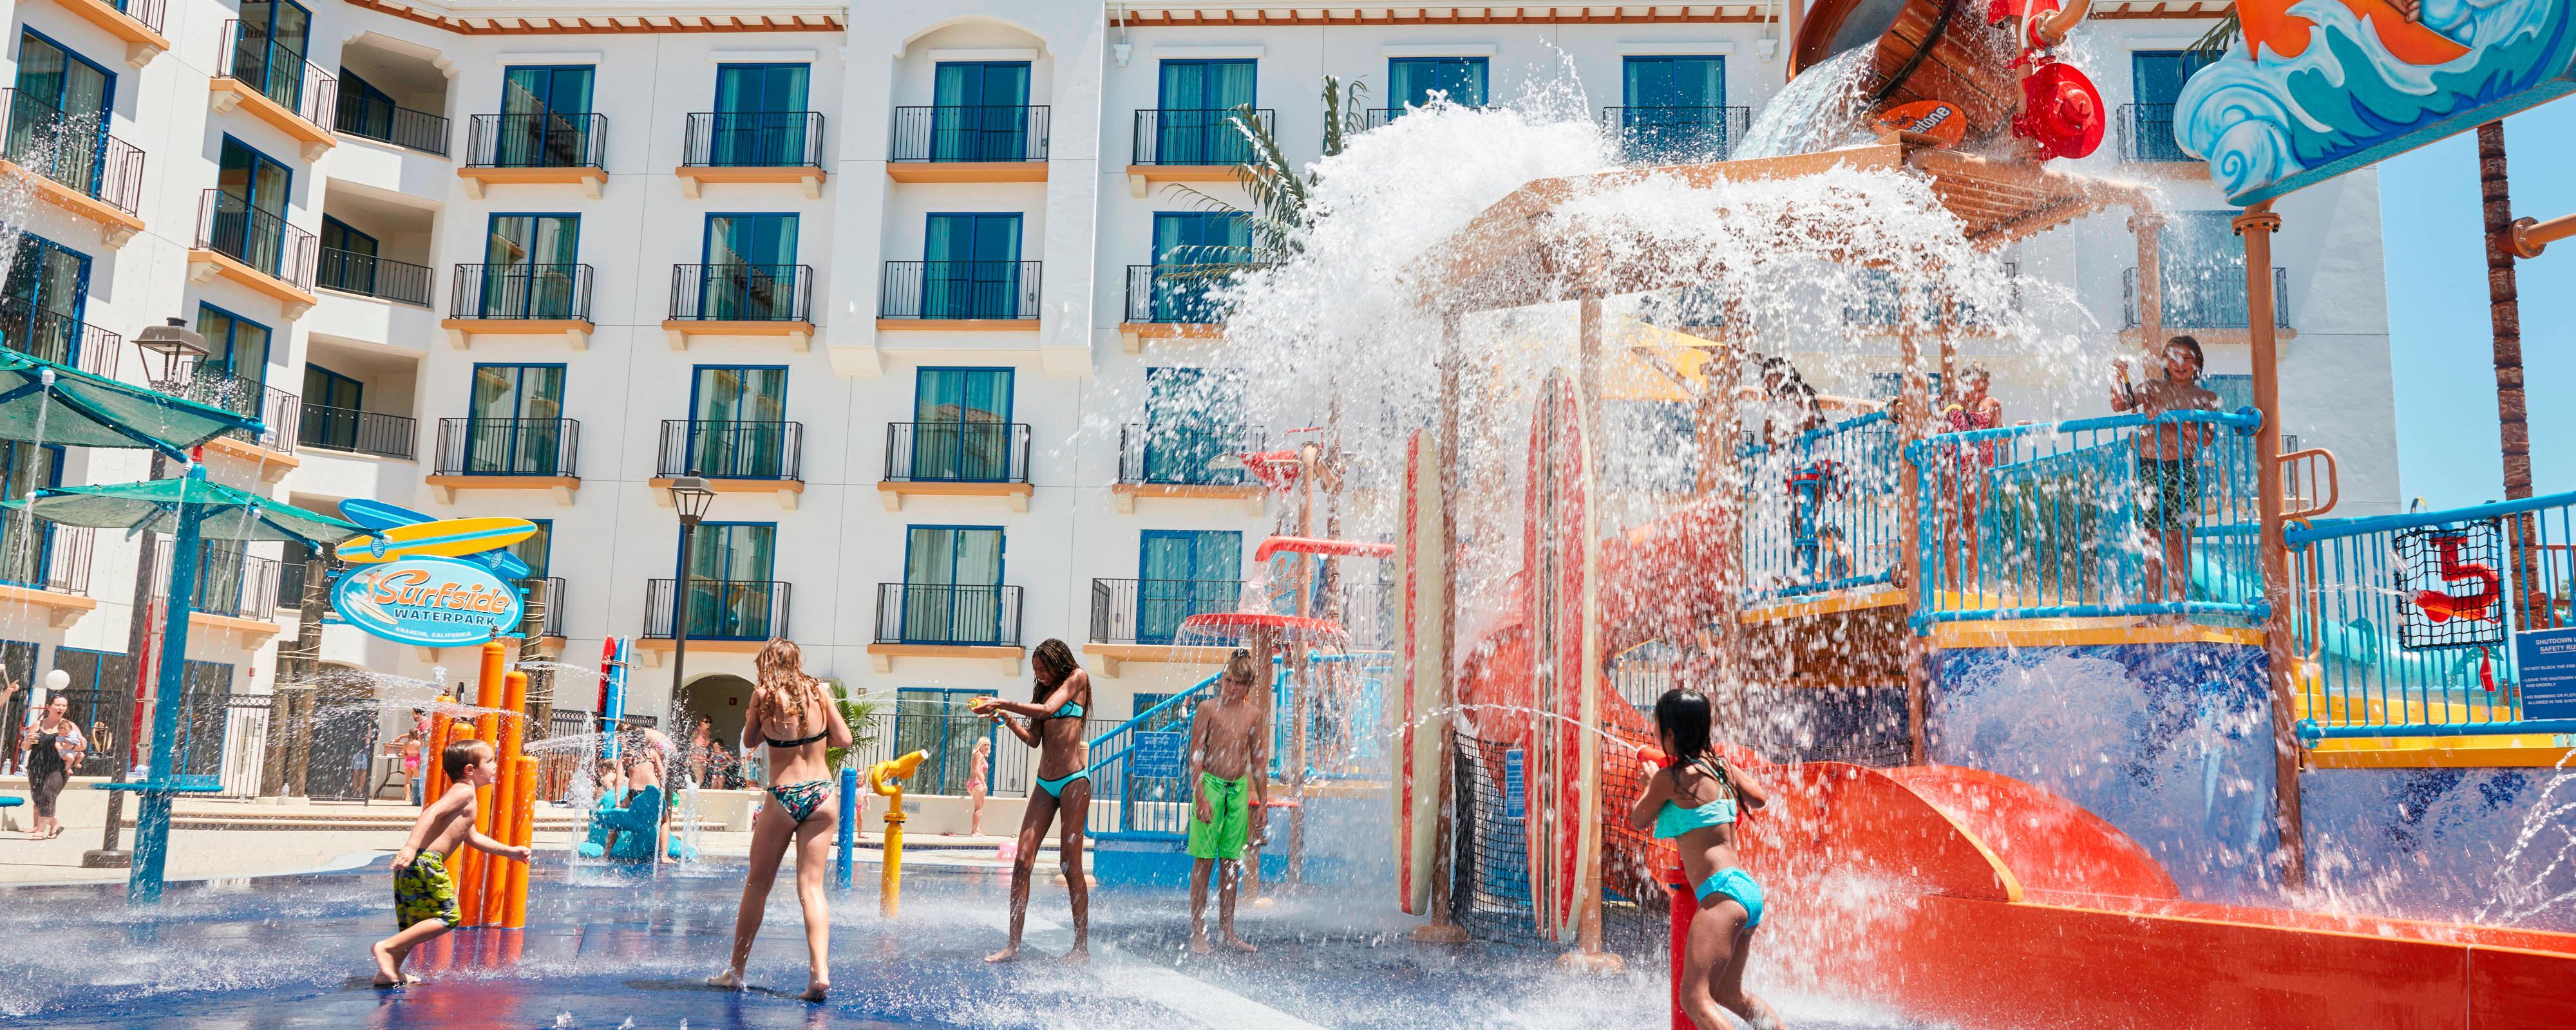 Courtyard Anaheim Theme Park Entrance pool area